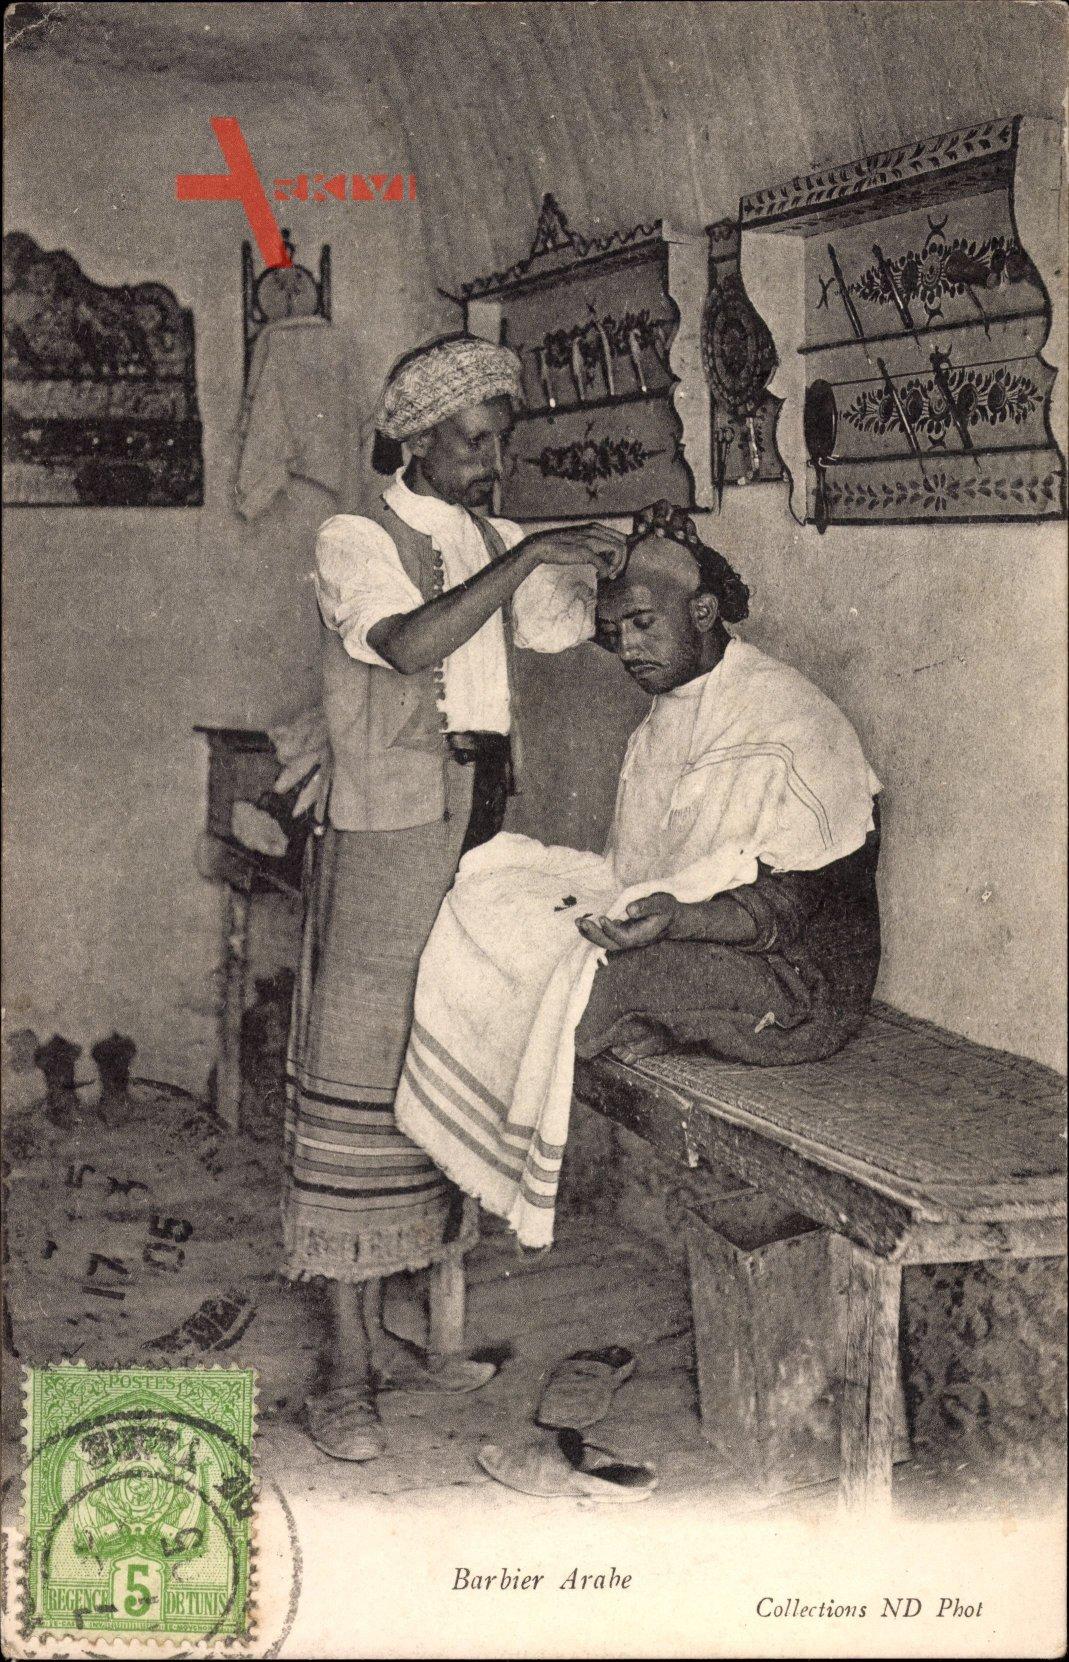 Barbier Arabe, Mann beim Friseur, Maghreb, Neurdein Frères N.D.